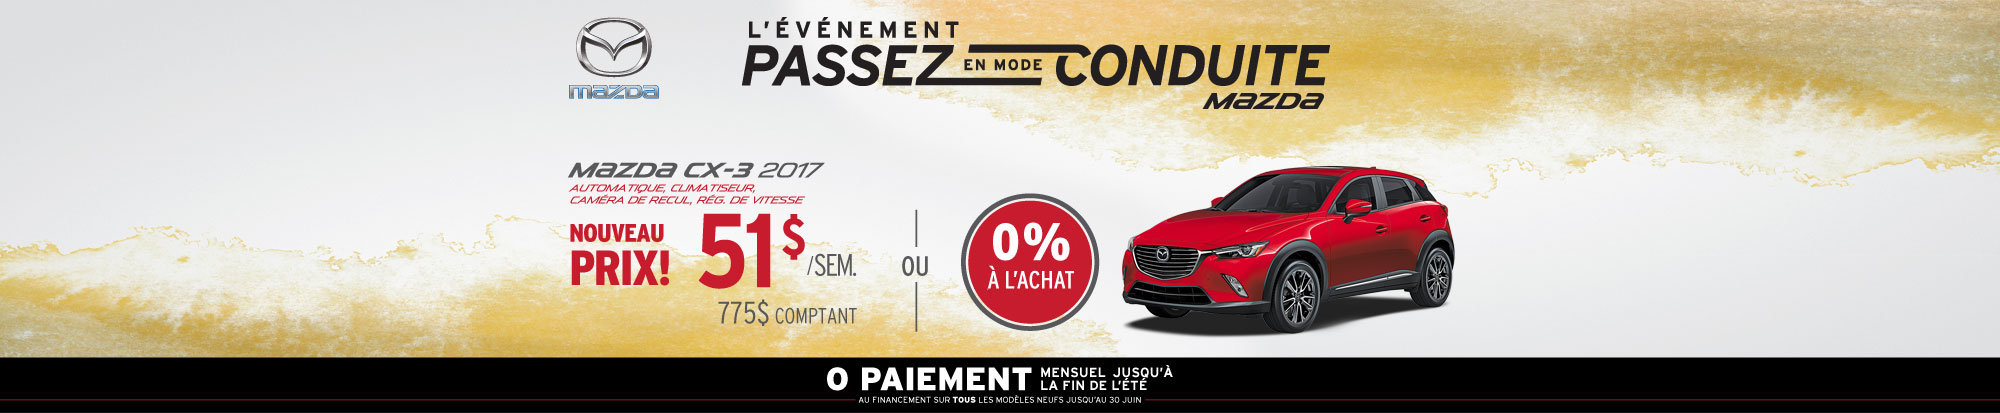 Louez la Mazda CX-3 (web)